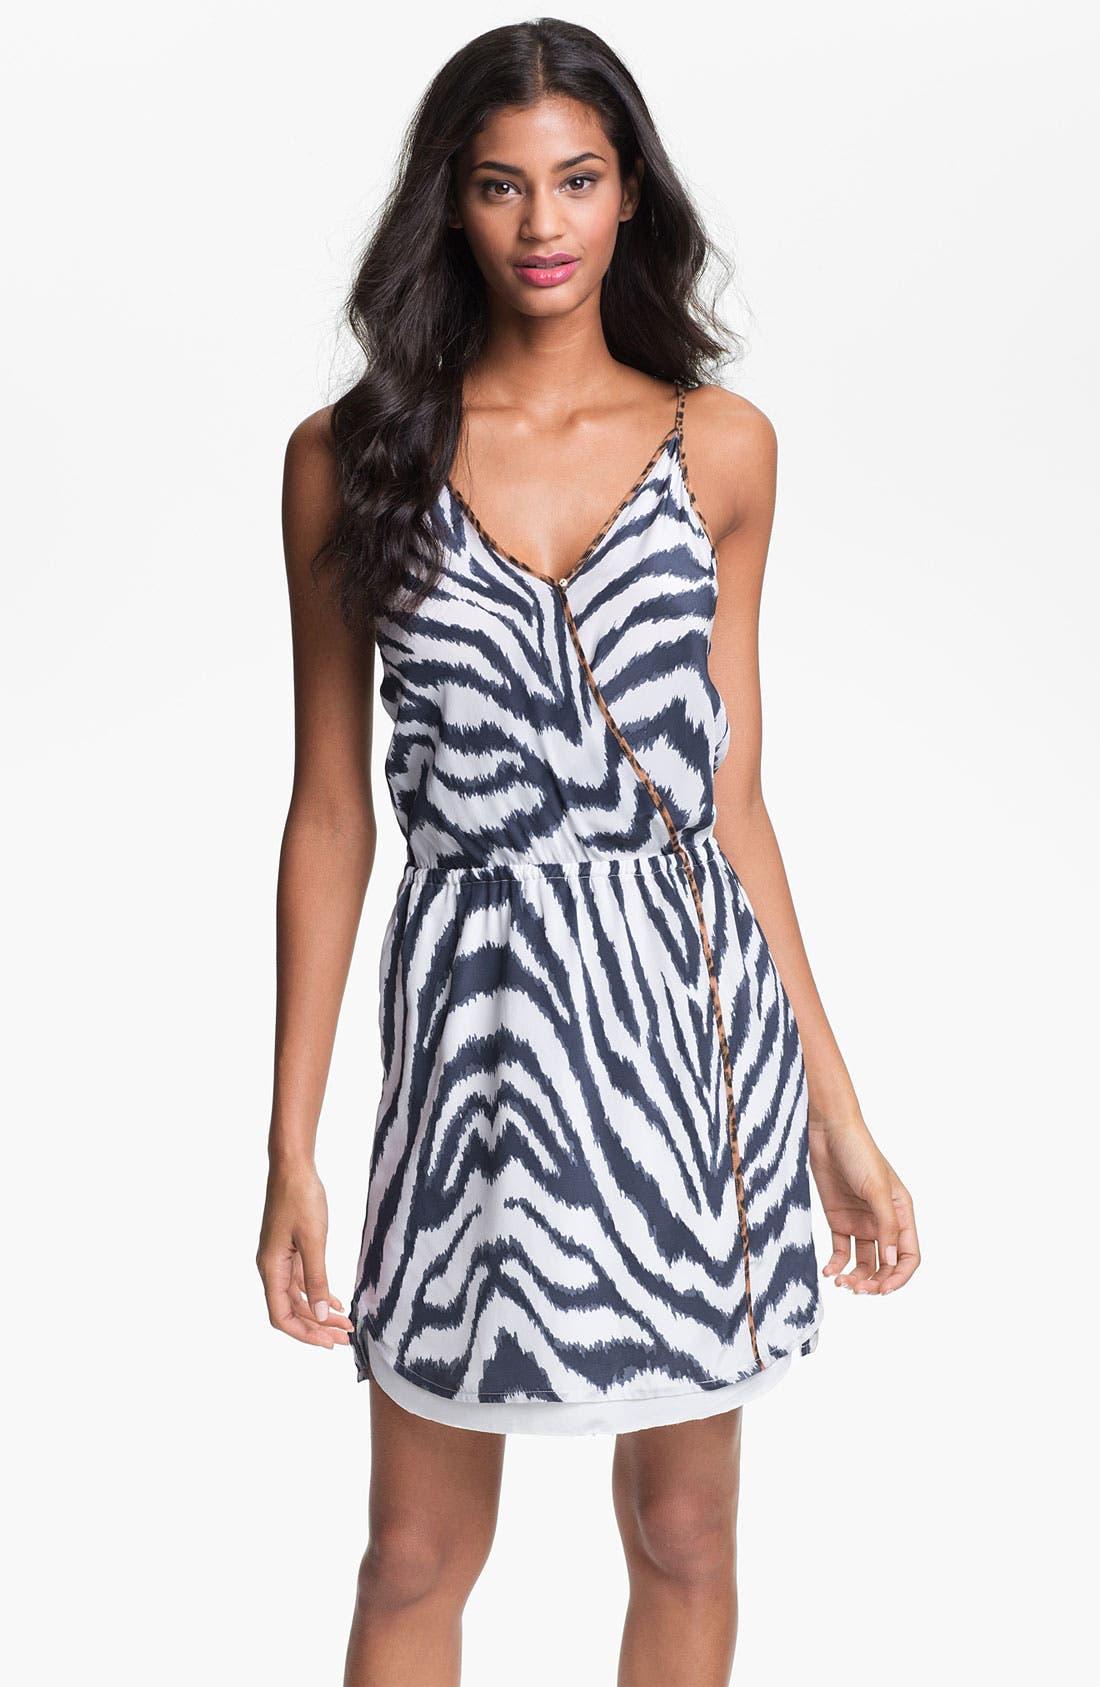 Alternate Image 1 Selected - ViX Swimwear 'Cape Navy Rachel' Cover-Up Dress